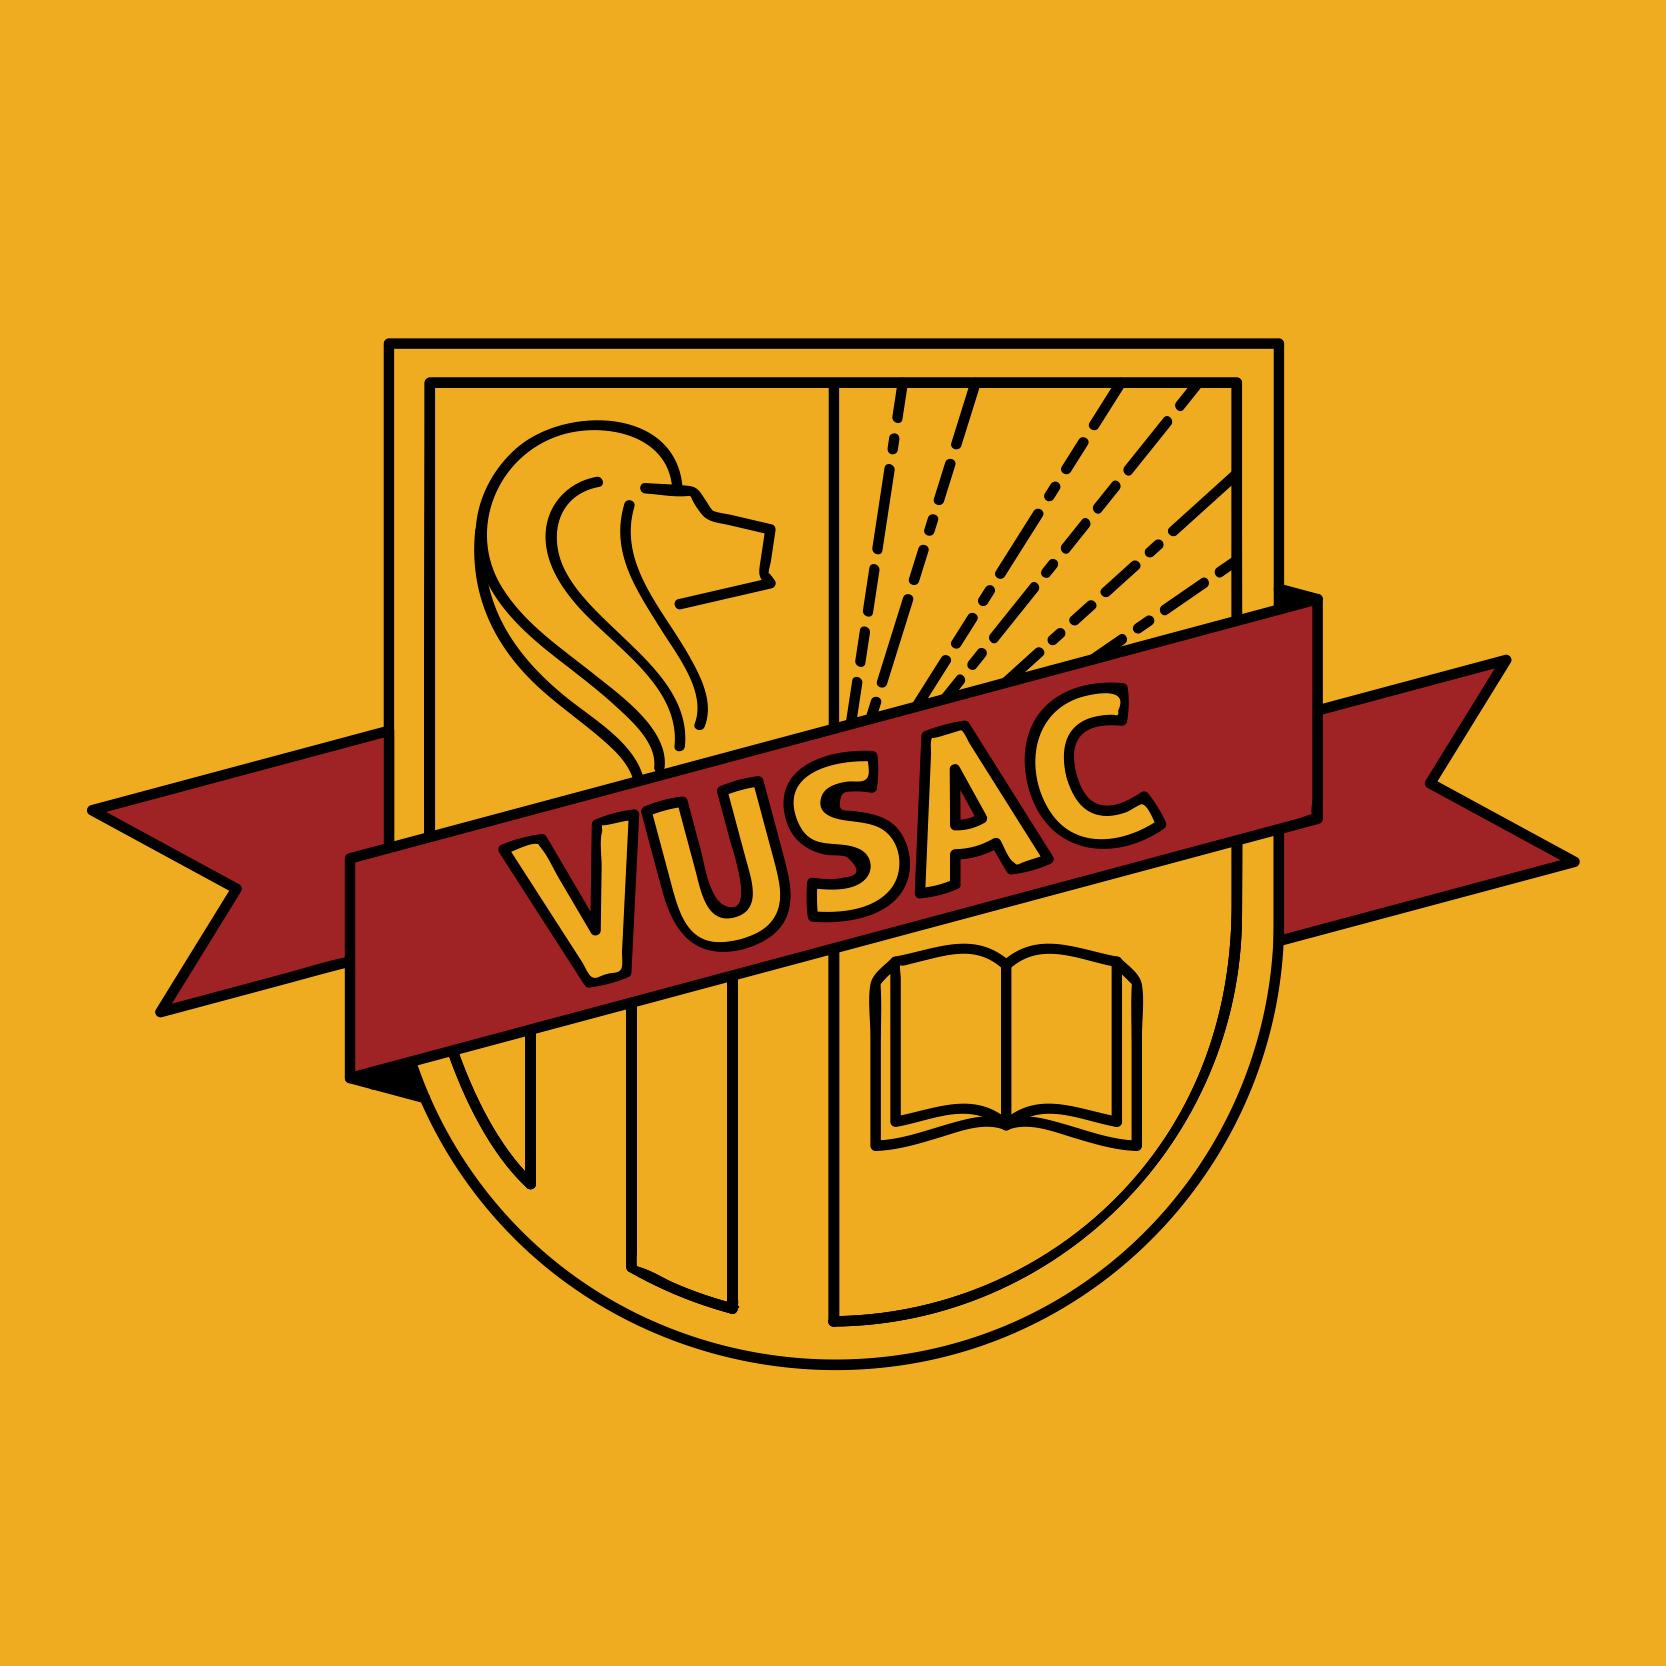 (c) Vusac.ca